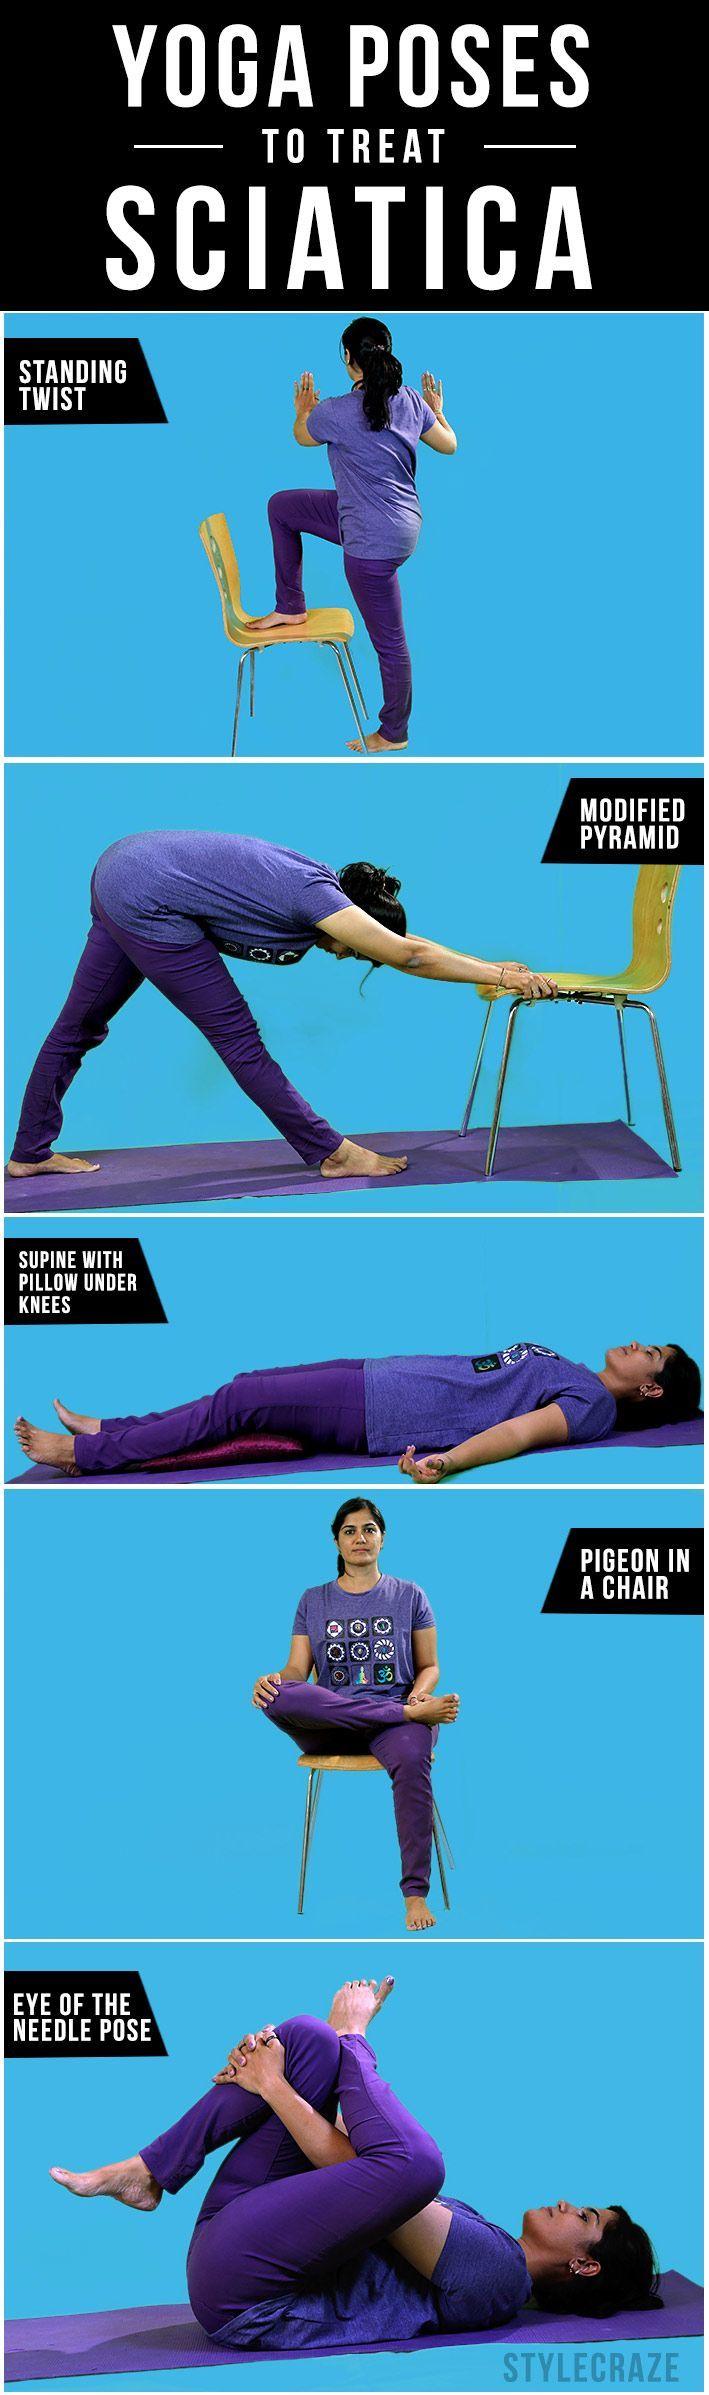 8 Effective Yoga Poses To Treat Sciatica